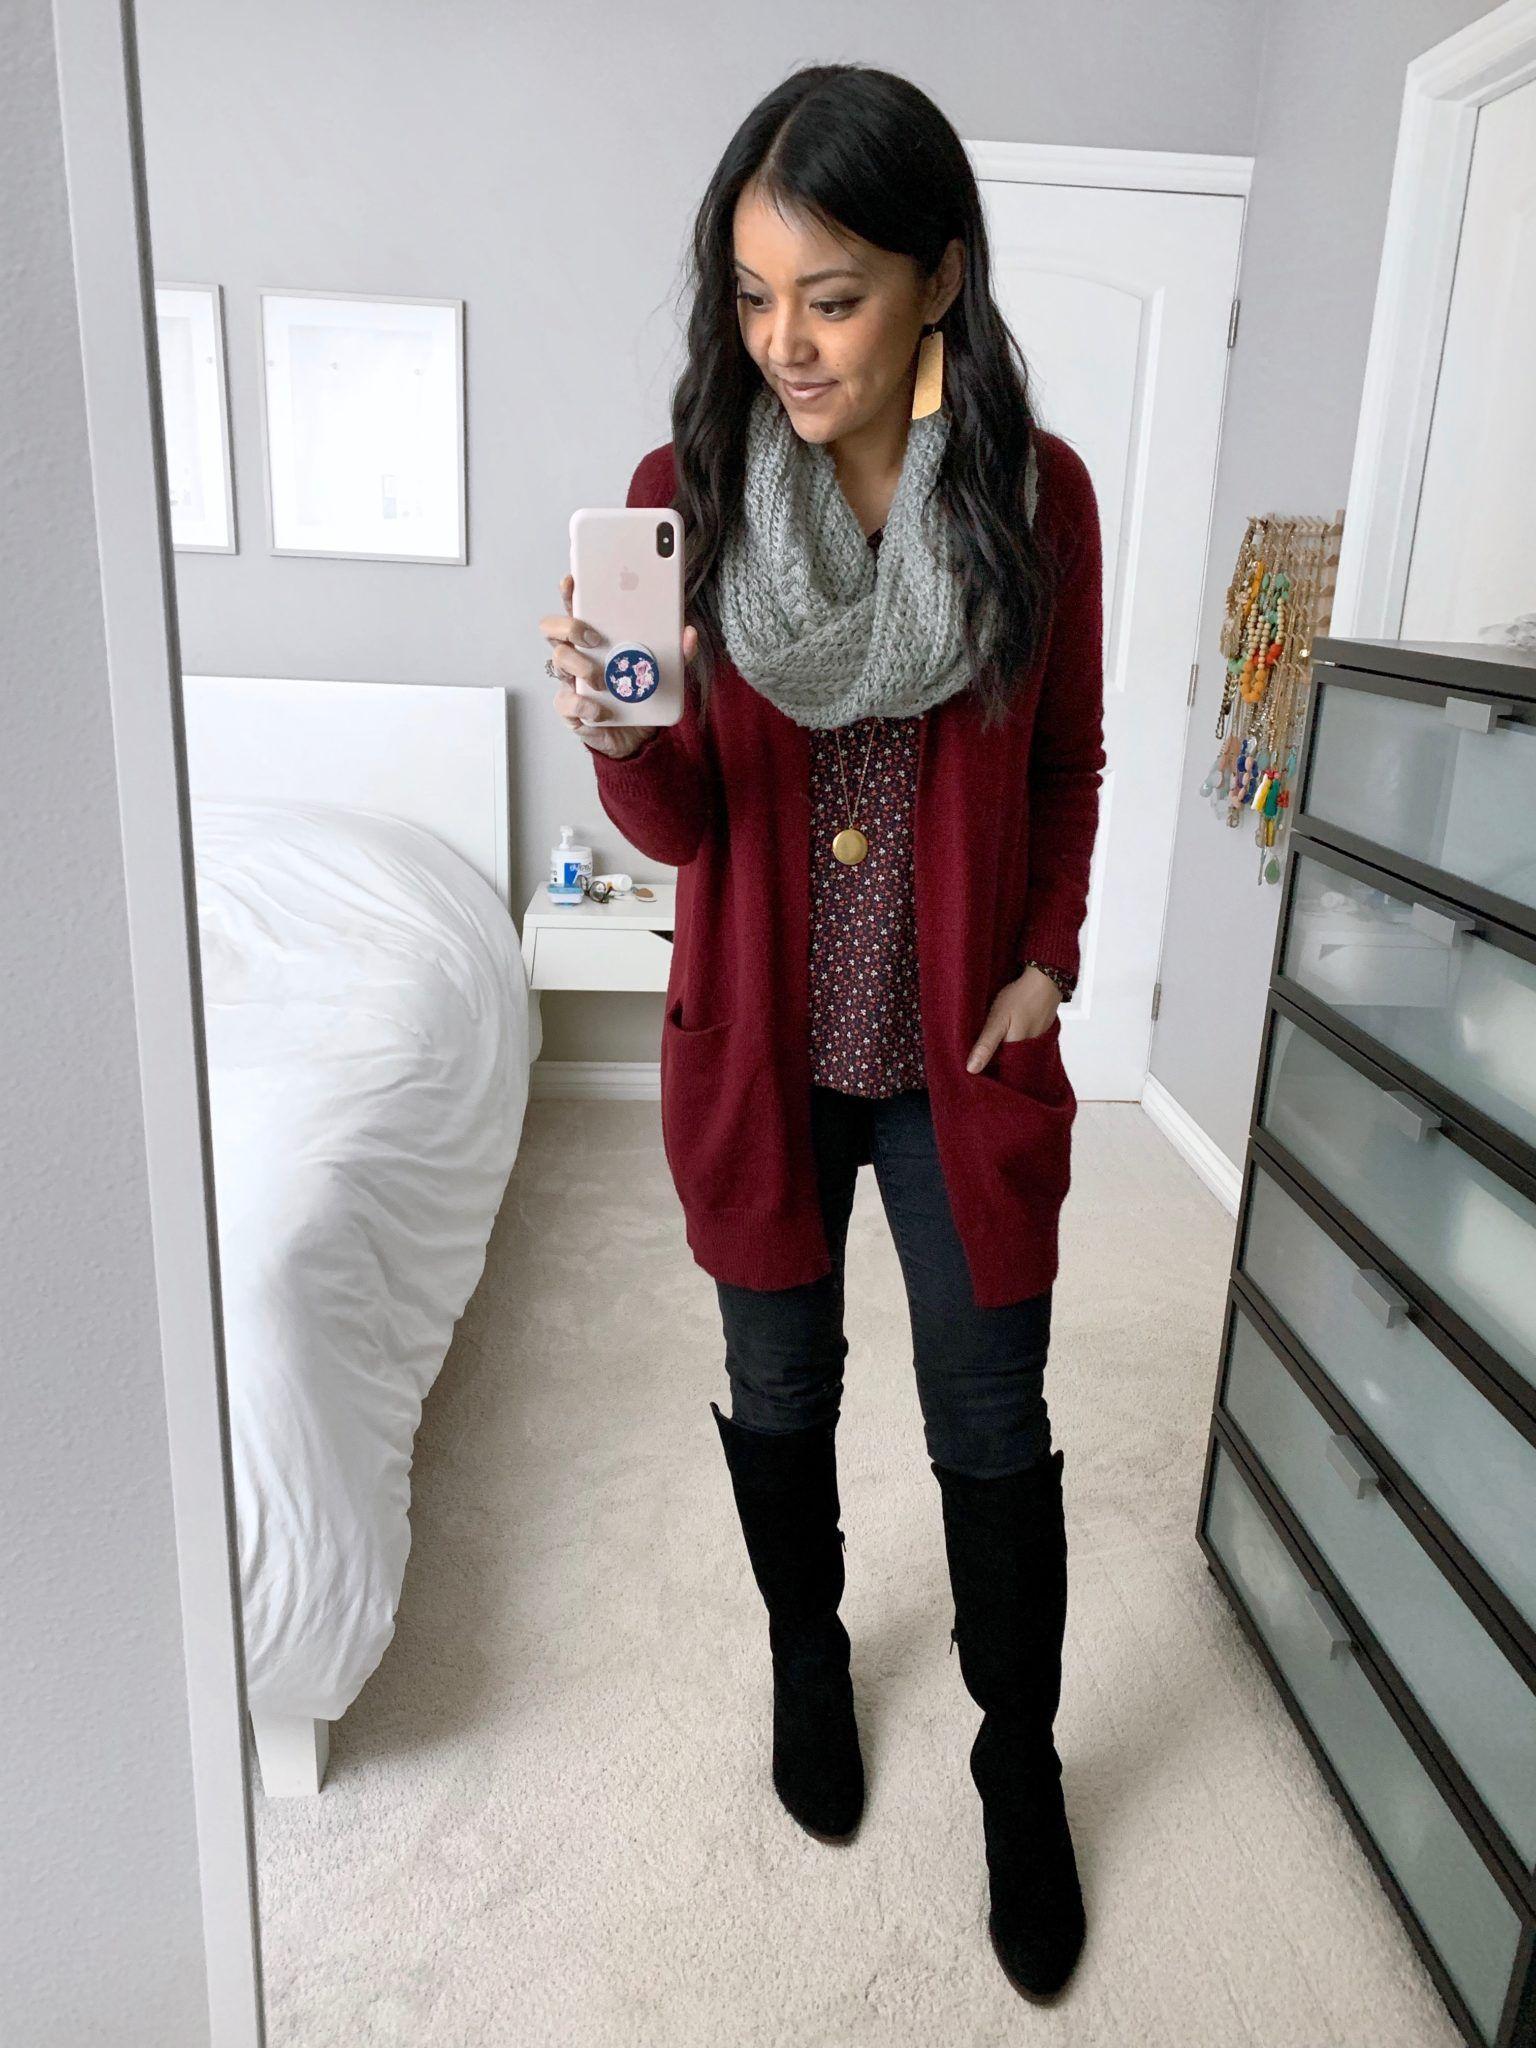 8bdacd3821a Floral print blouse+dark denim skinny jeans+black boots+dark red   burgundy  cardigan+grey knit scarf+gold pendant necklace+earrings.